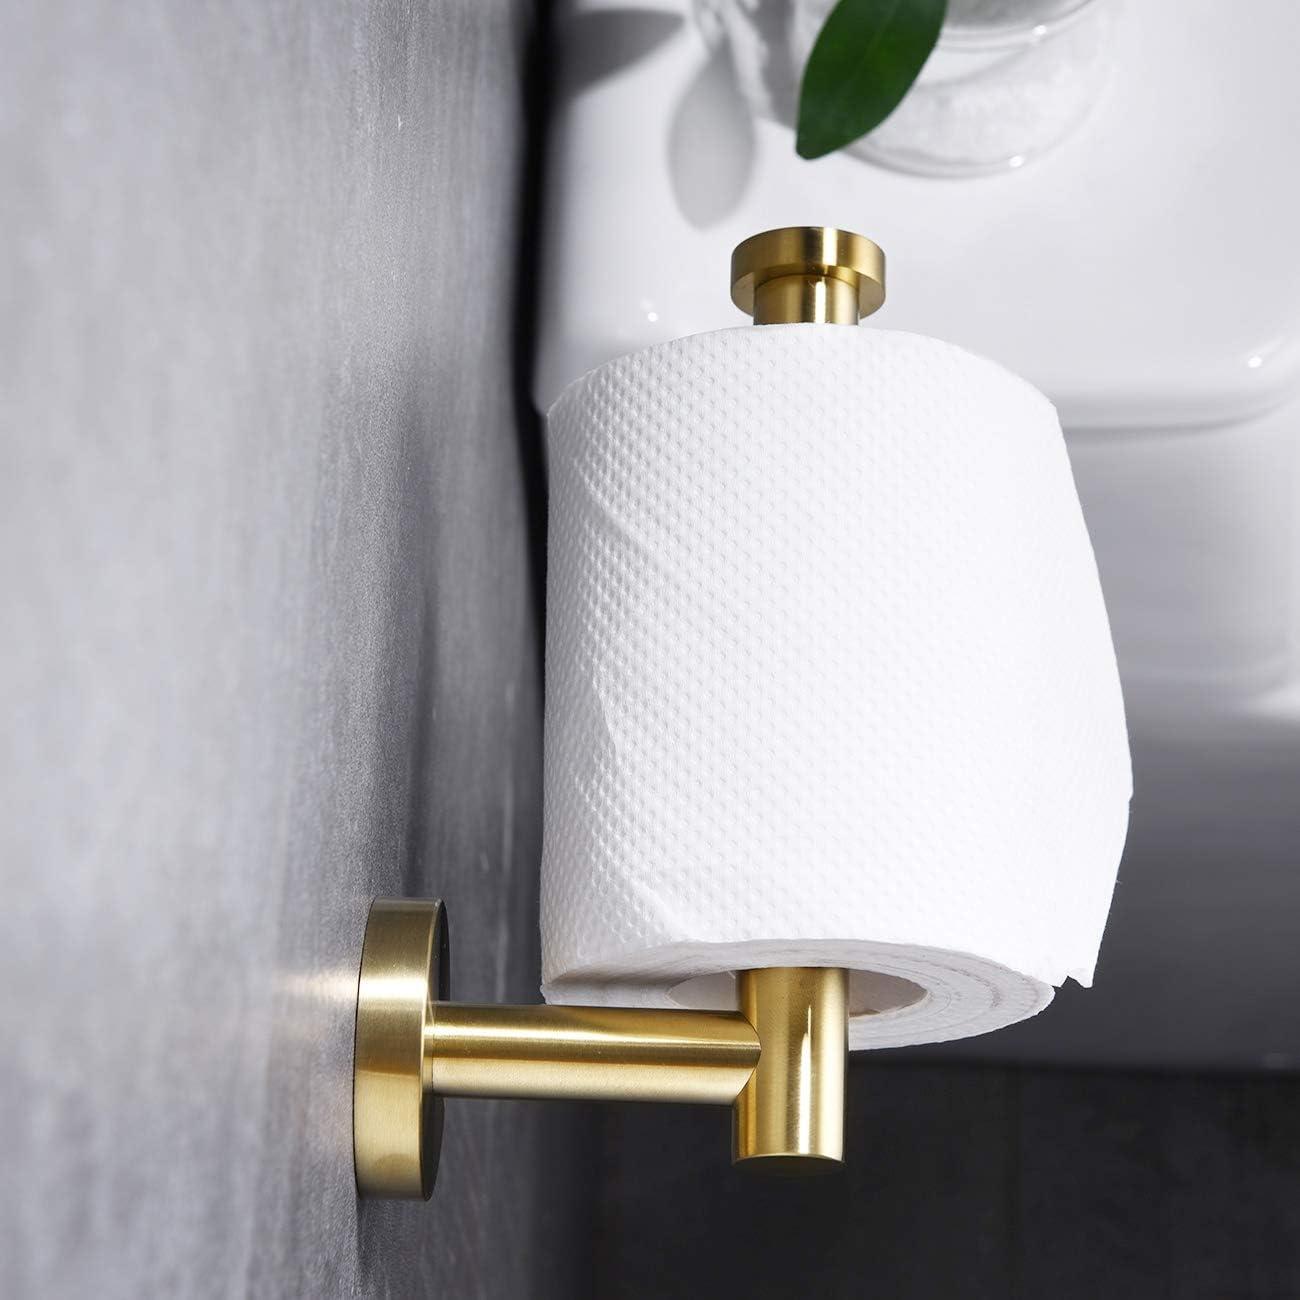 C100L12-BG Brushed Gold Finish Hoooh Toilet Paper Holder SUS304 Stainless Steel Bathroom Lavatory Paper Towel Dispenser Wall Mount